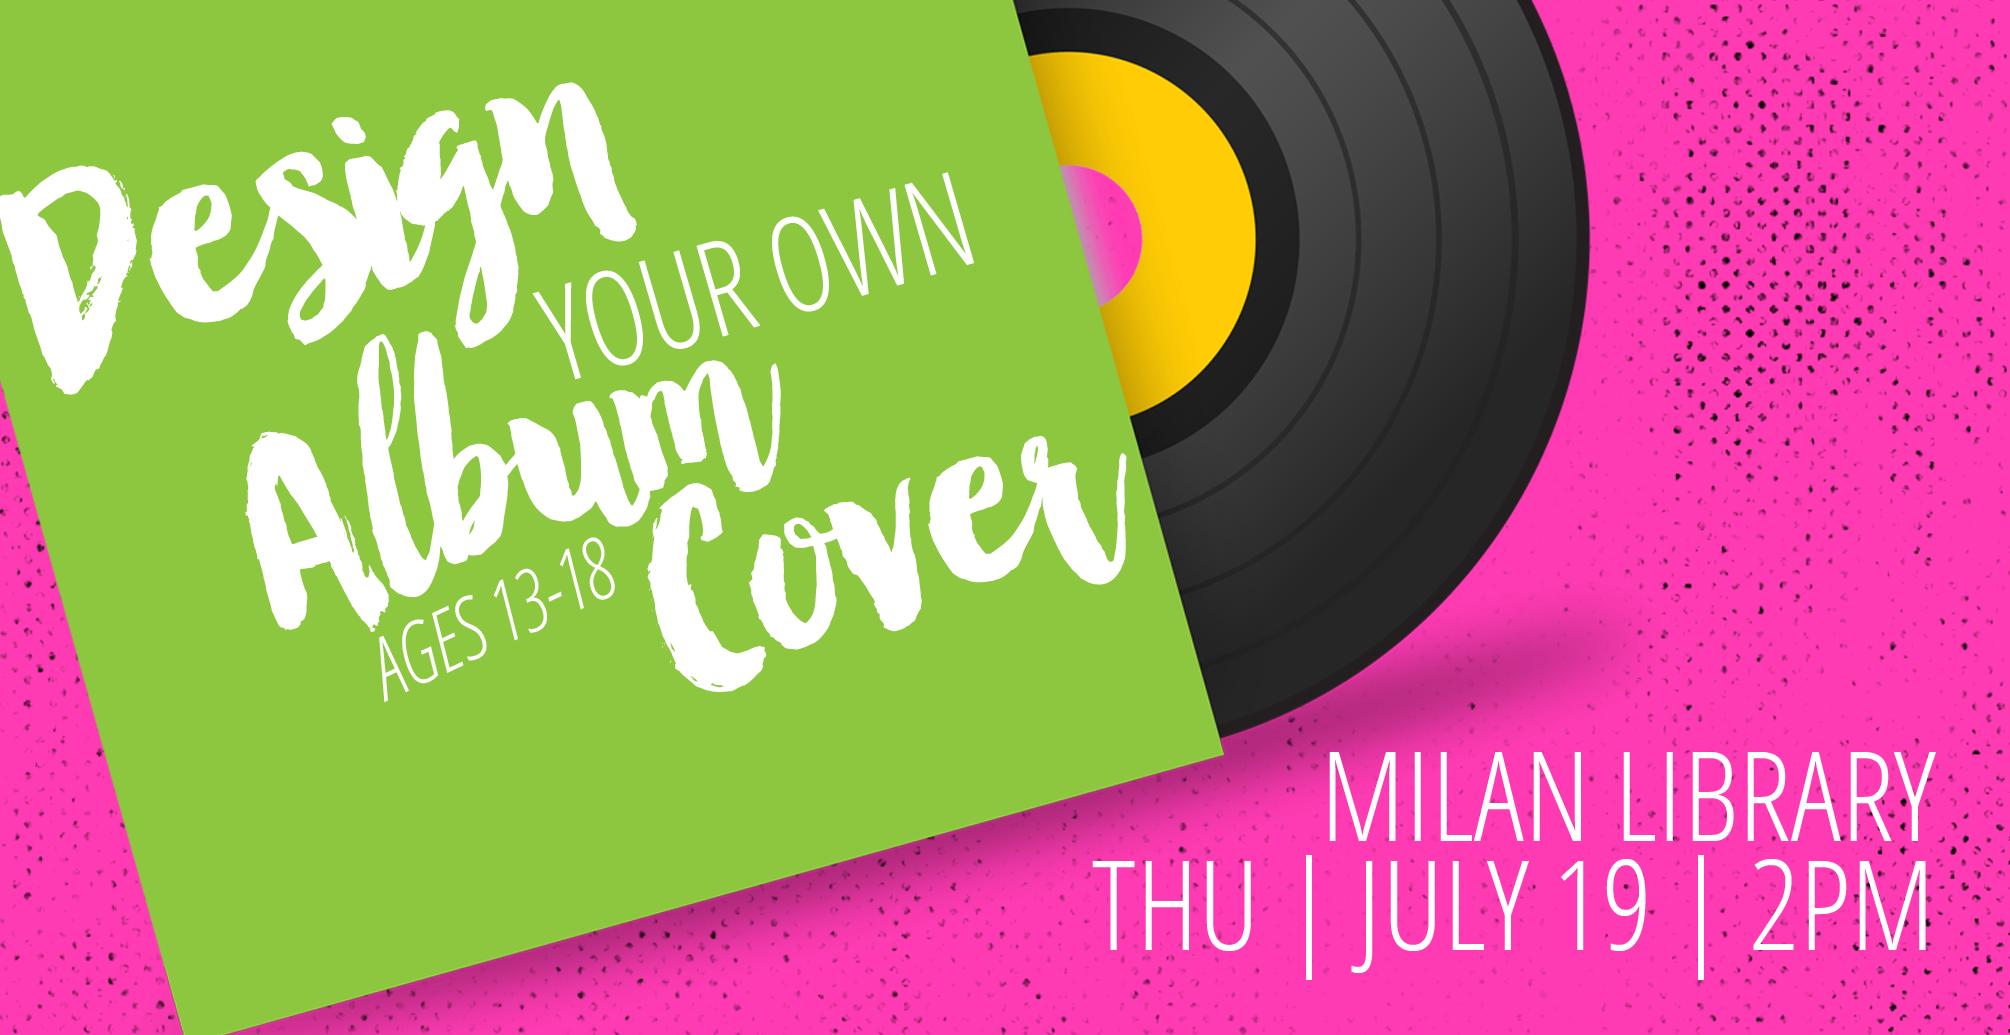 2018-07-TEEN-Milan-Design-Your-Own-Album-Cover-Slide